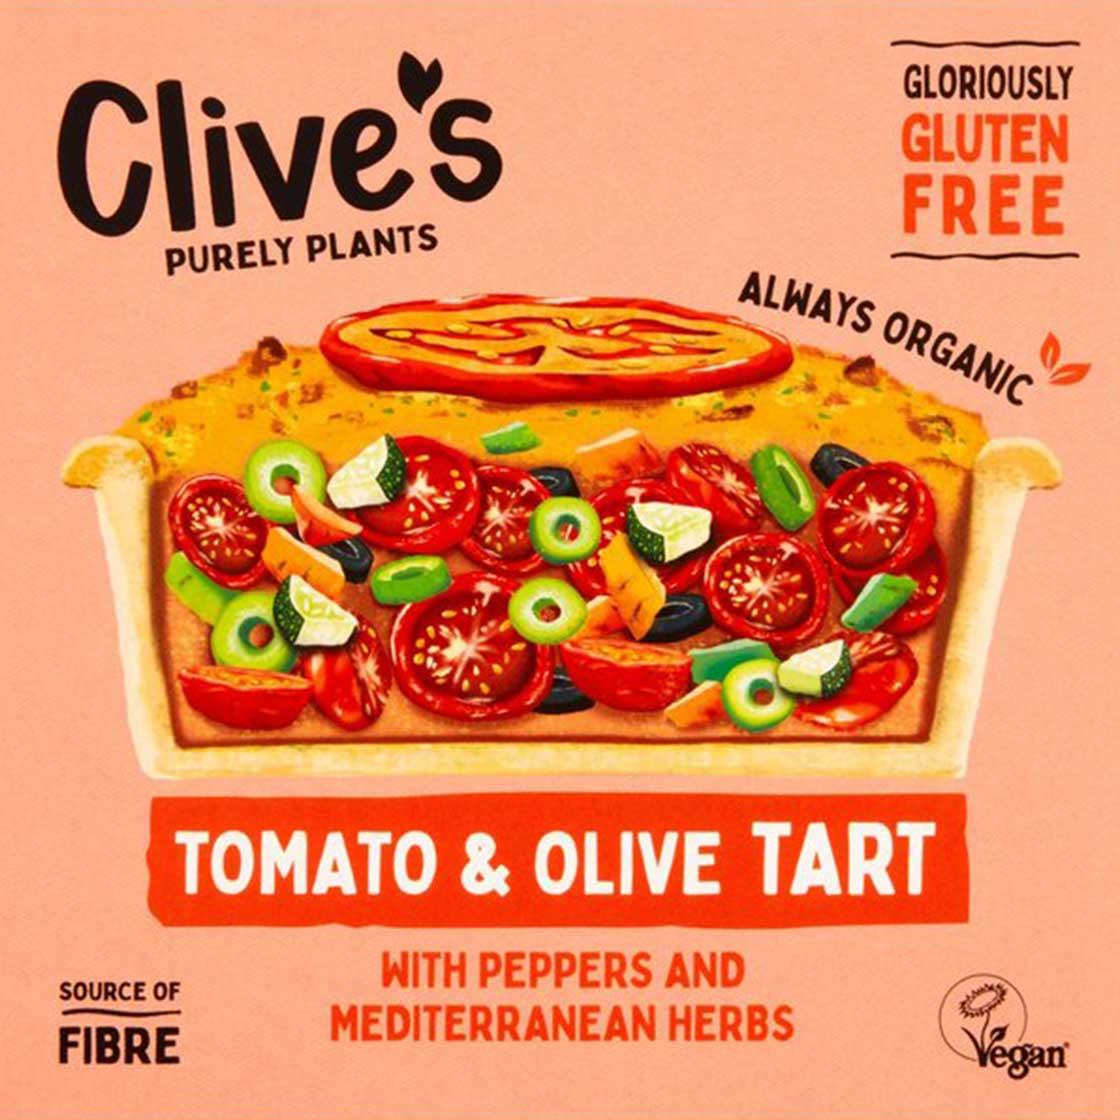 Tomato & Olive Provencale Tart, 190g (Gluten Free, Organic, Vegan)